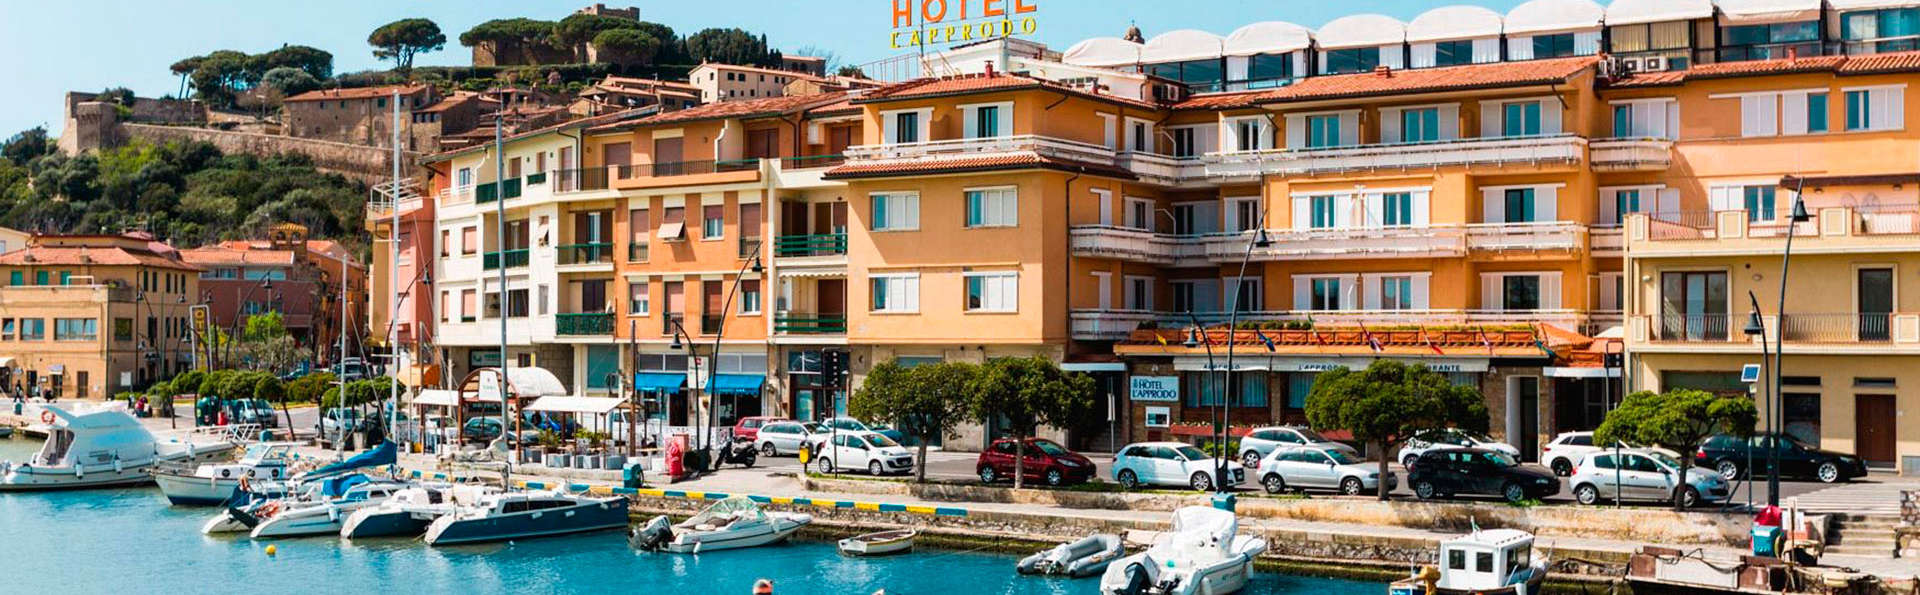 Hotel L'Approdo - EDIT_front.jpg